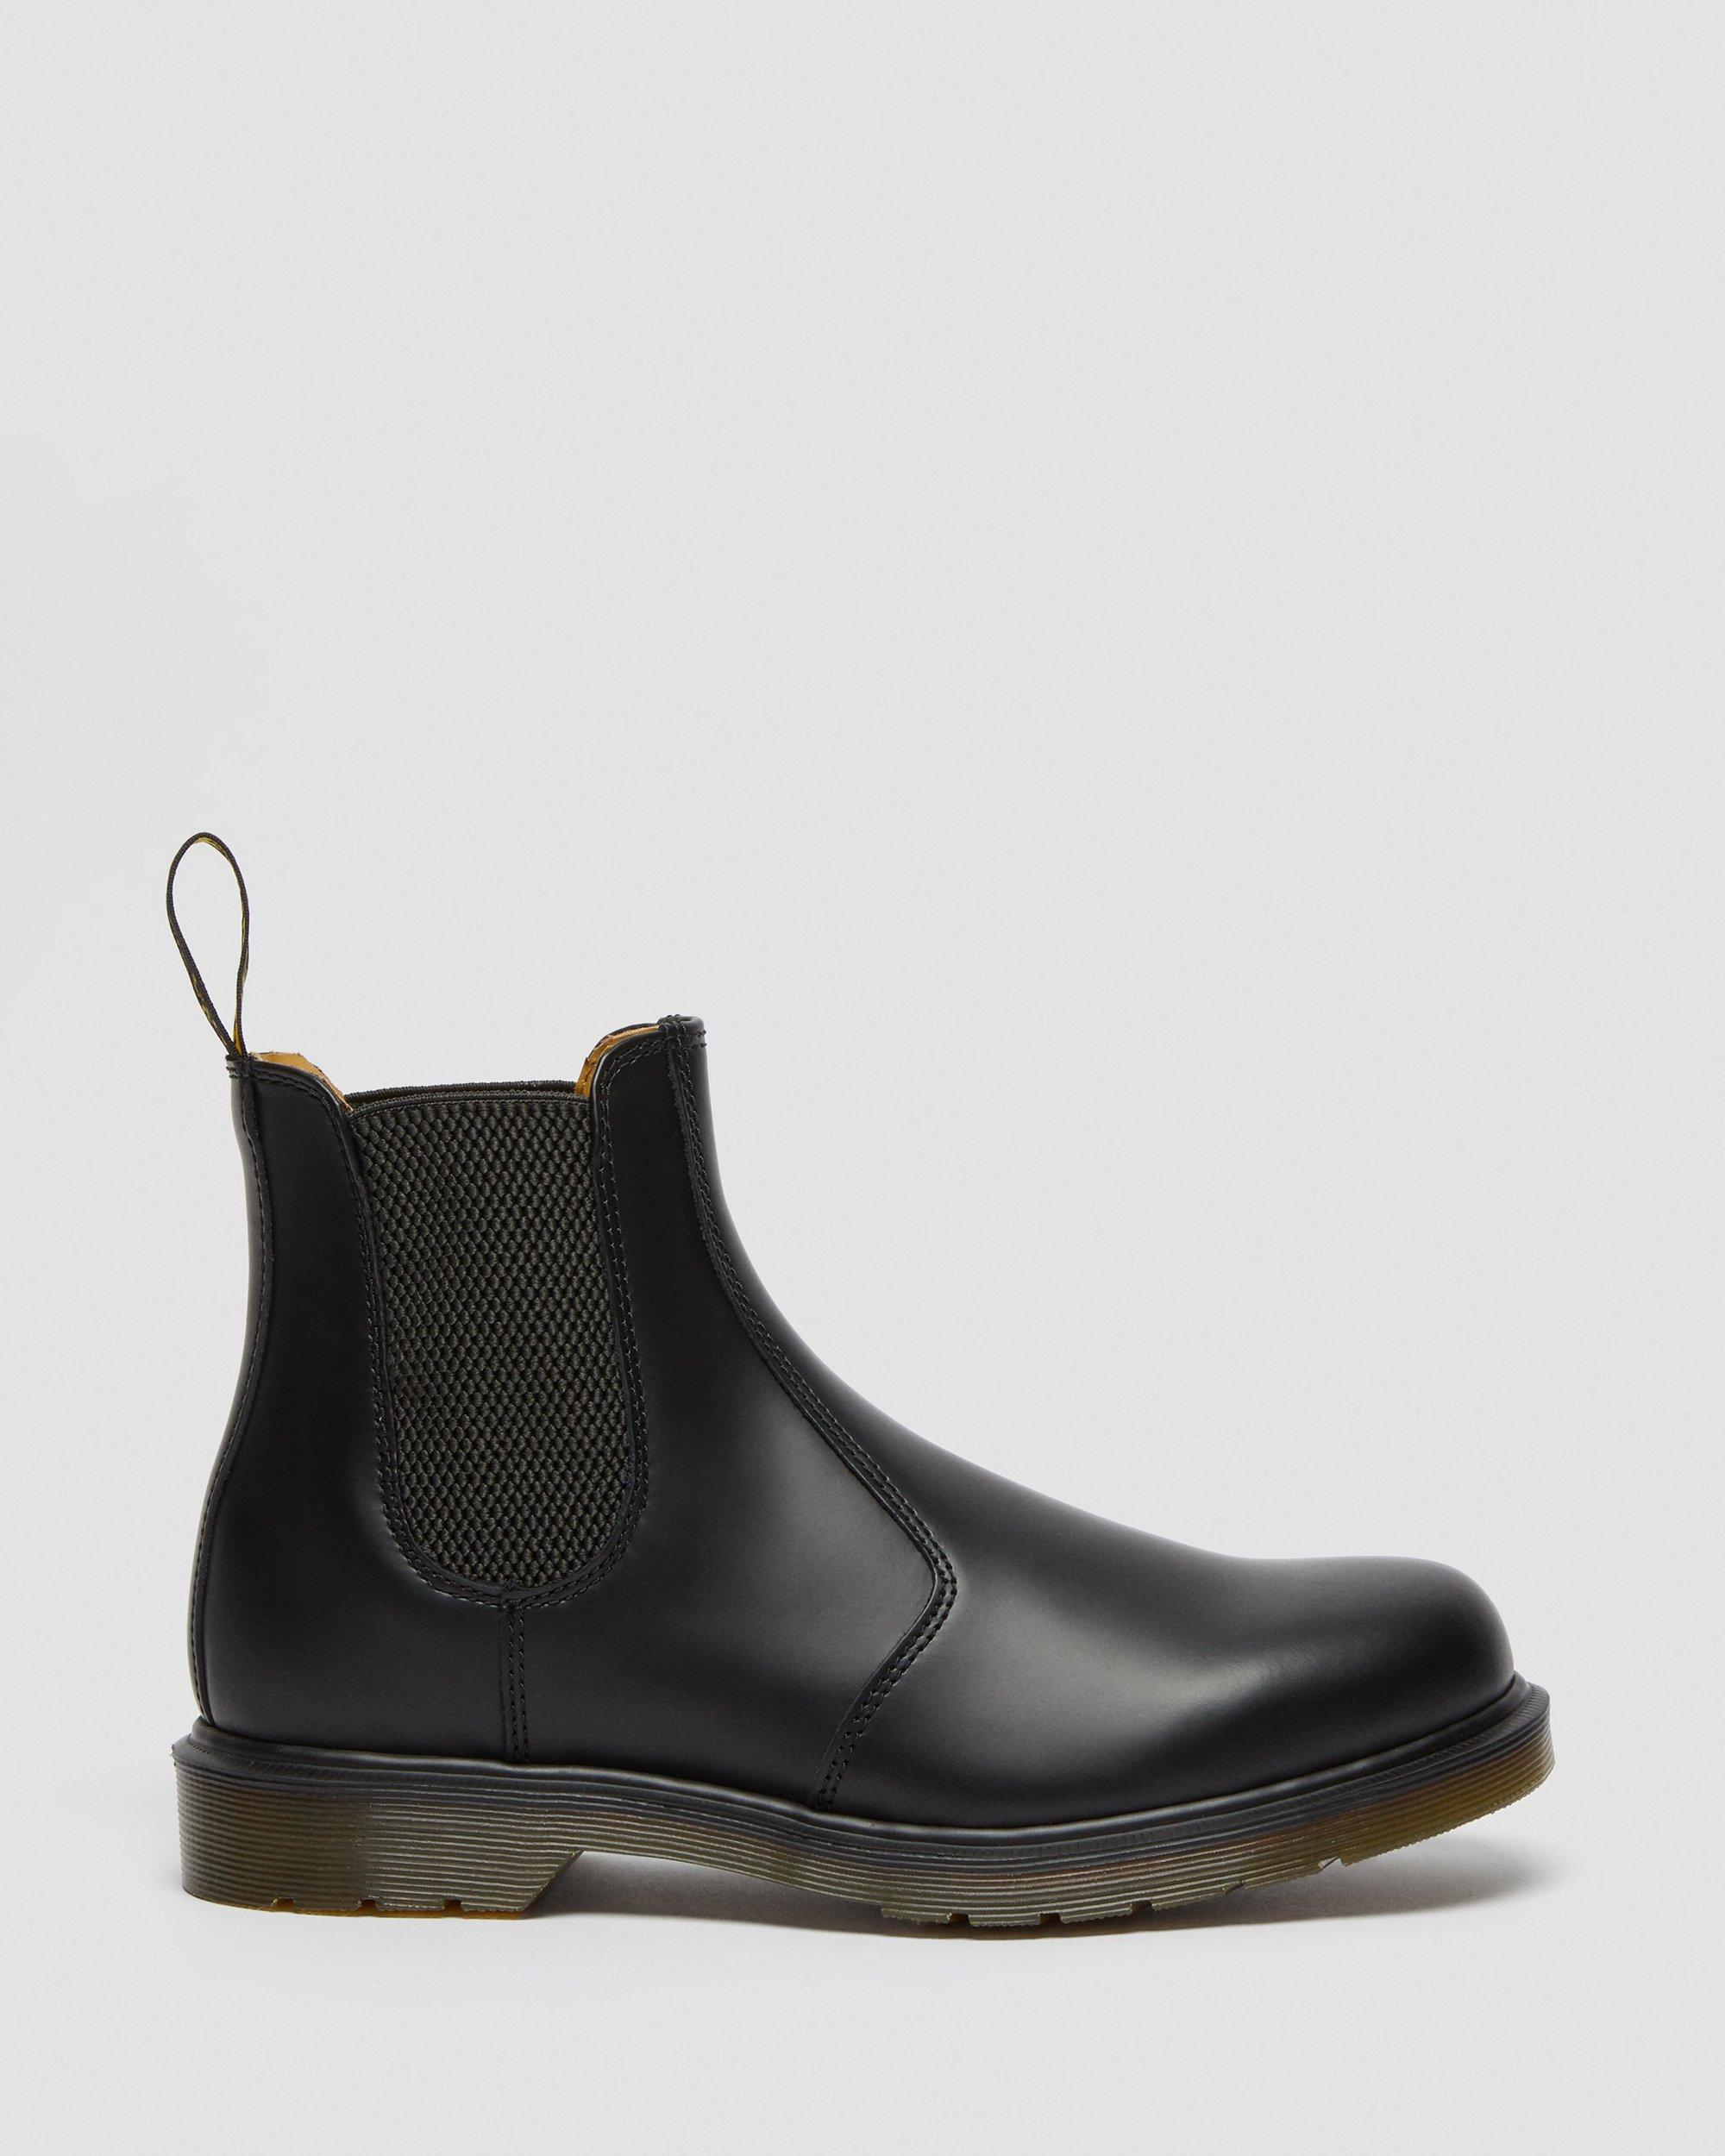 ankle boots size 4  black faux leather block heel JK-15